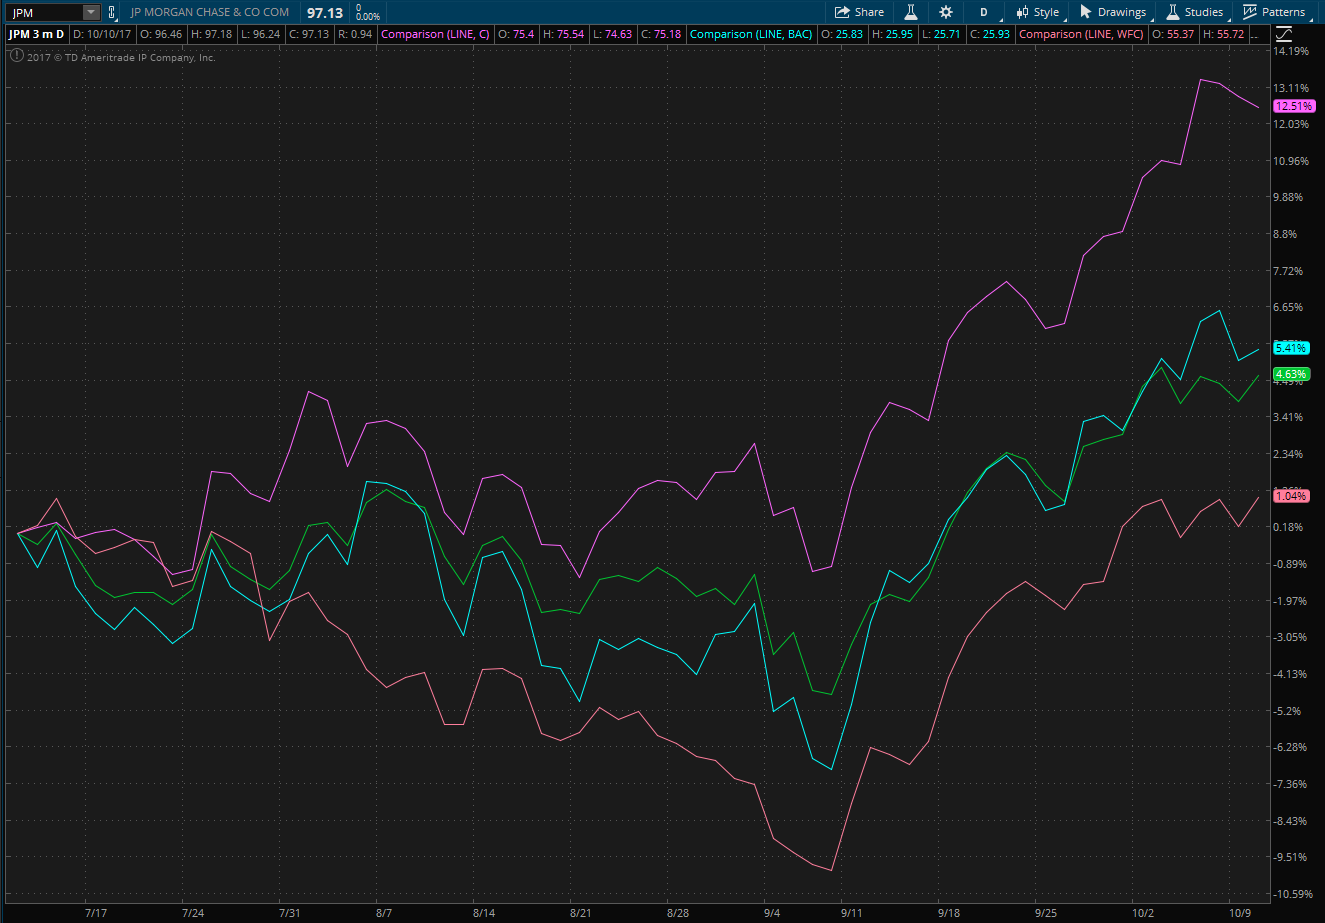 Thinkorswim chart showing three month performance of JPM, BAC, WFC and C stocks